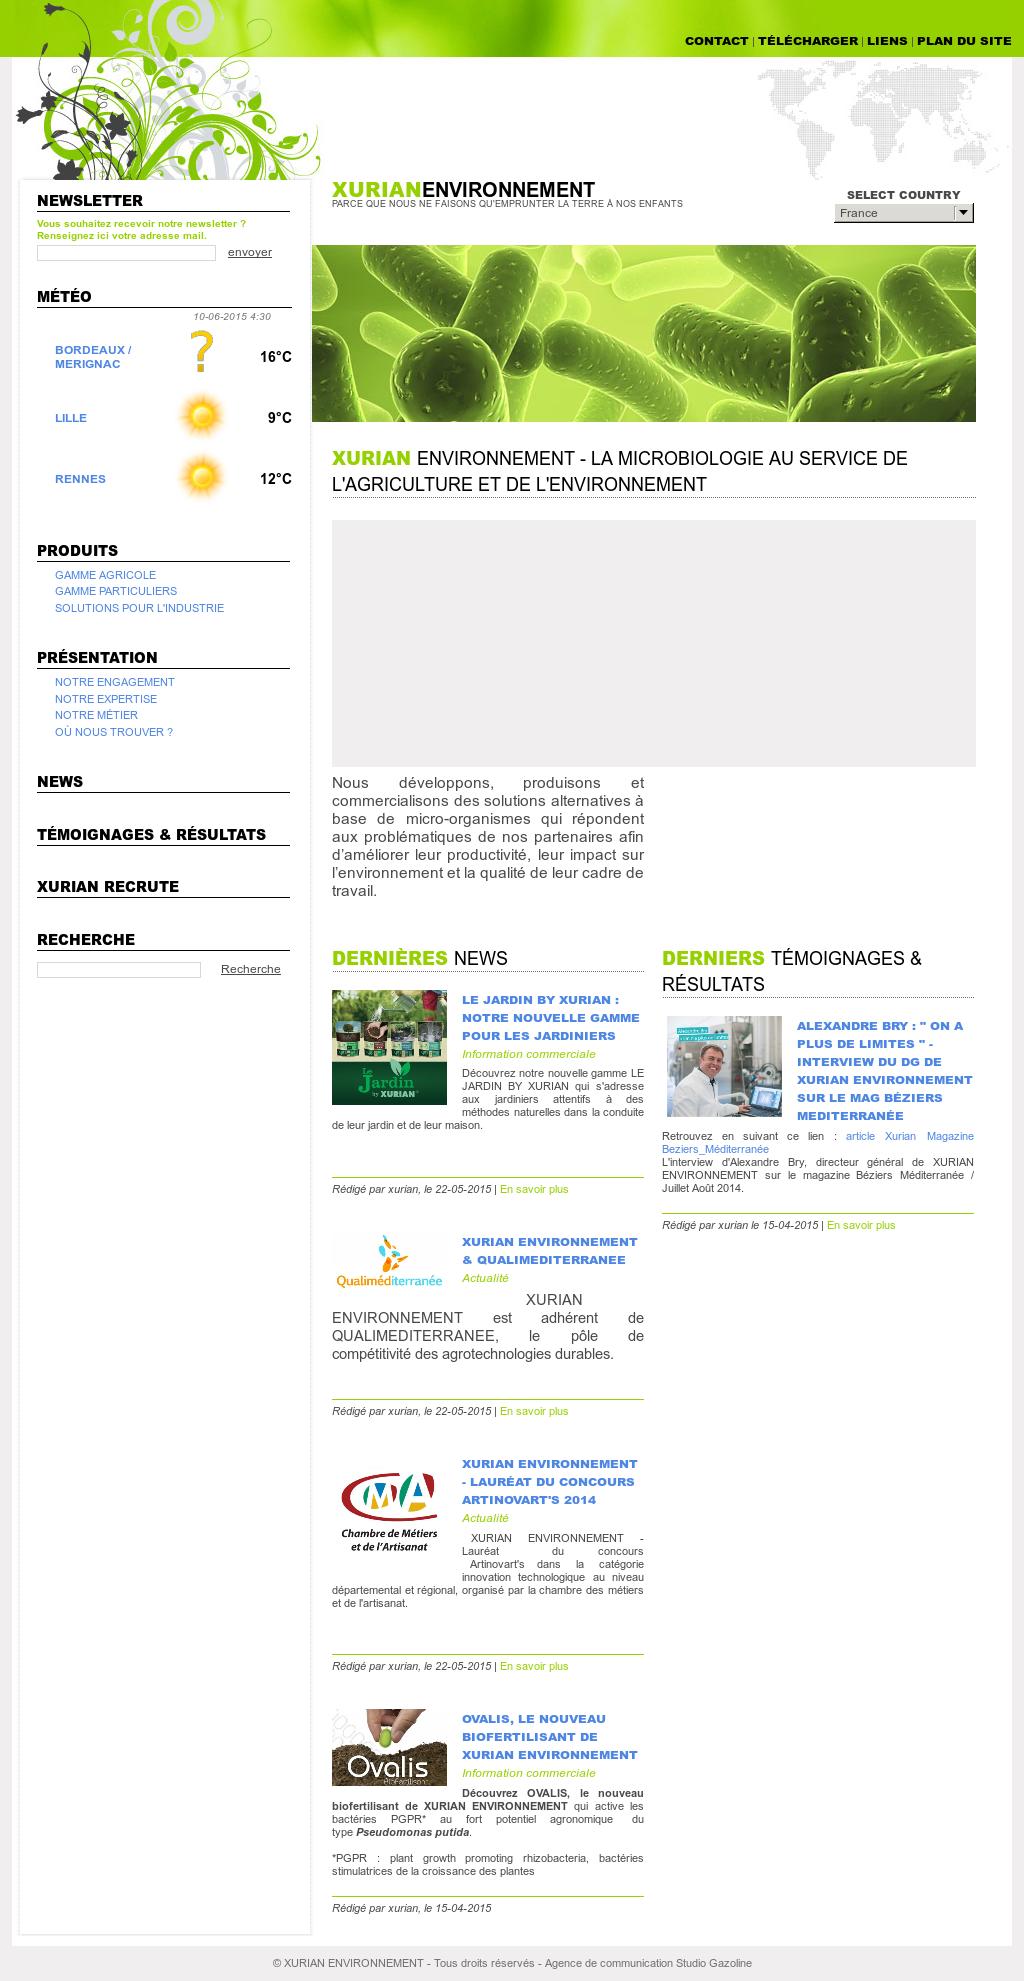 C Maison Et Jardin Magazine xurian environnement competitors, revenue and employees